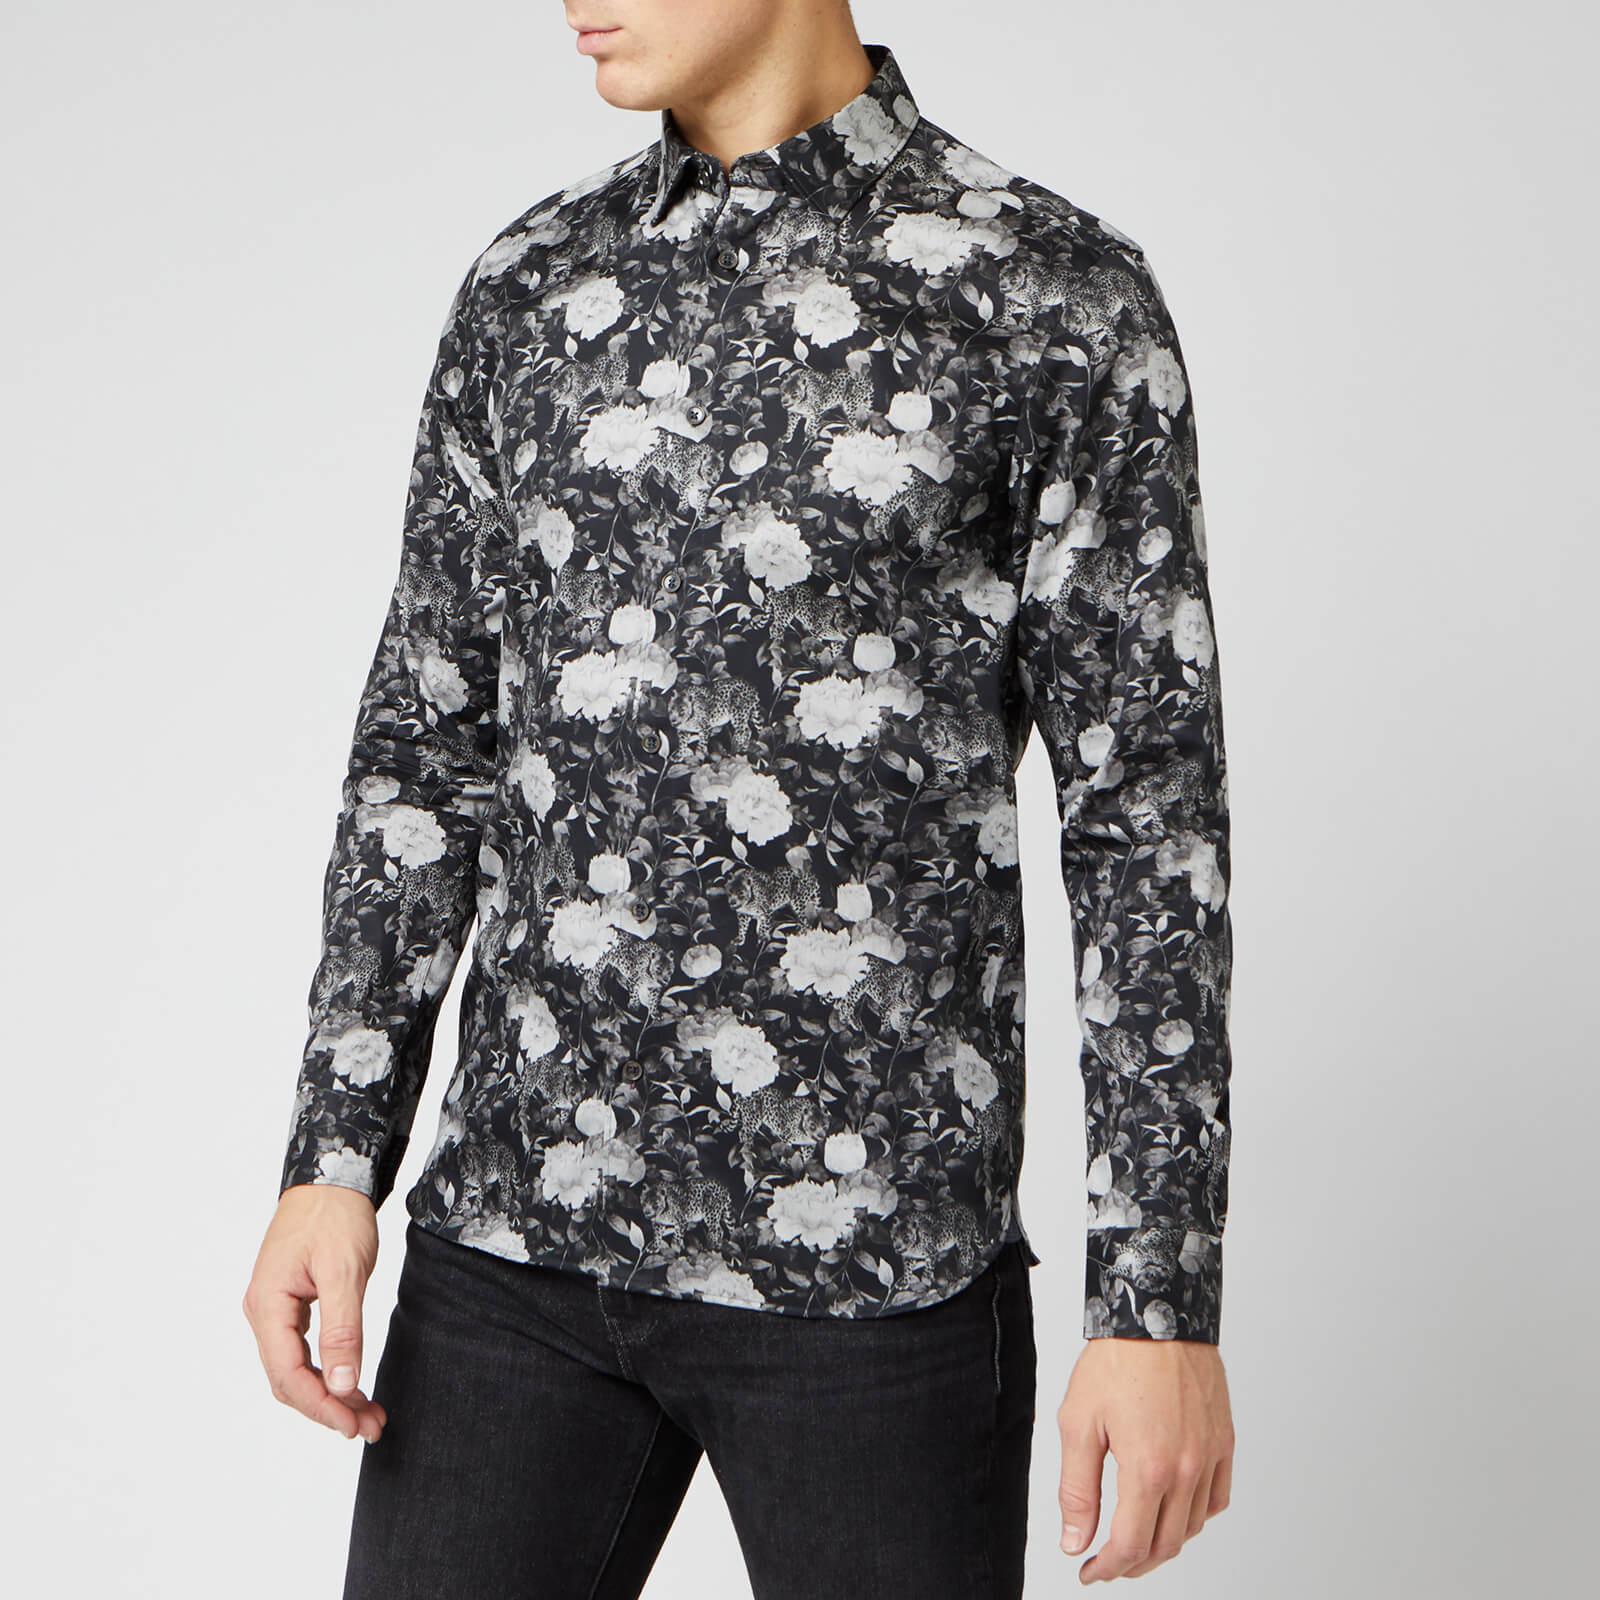 Ted Baker Men's Stylo Floral Shirt - Black - M/3